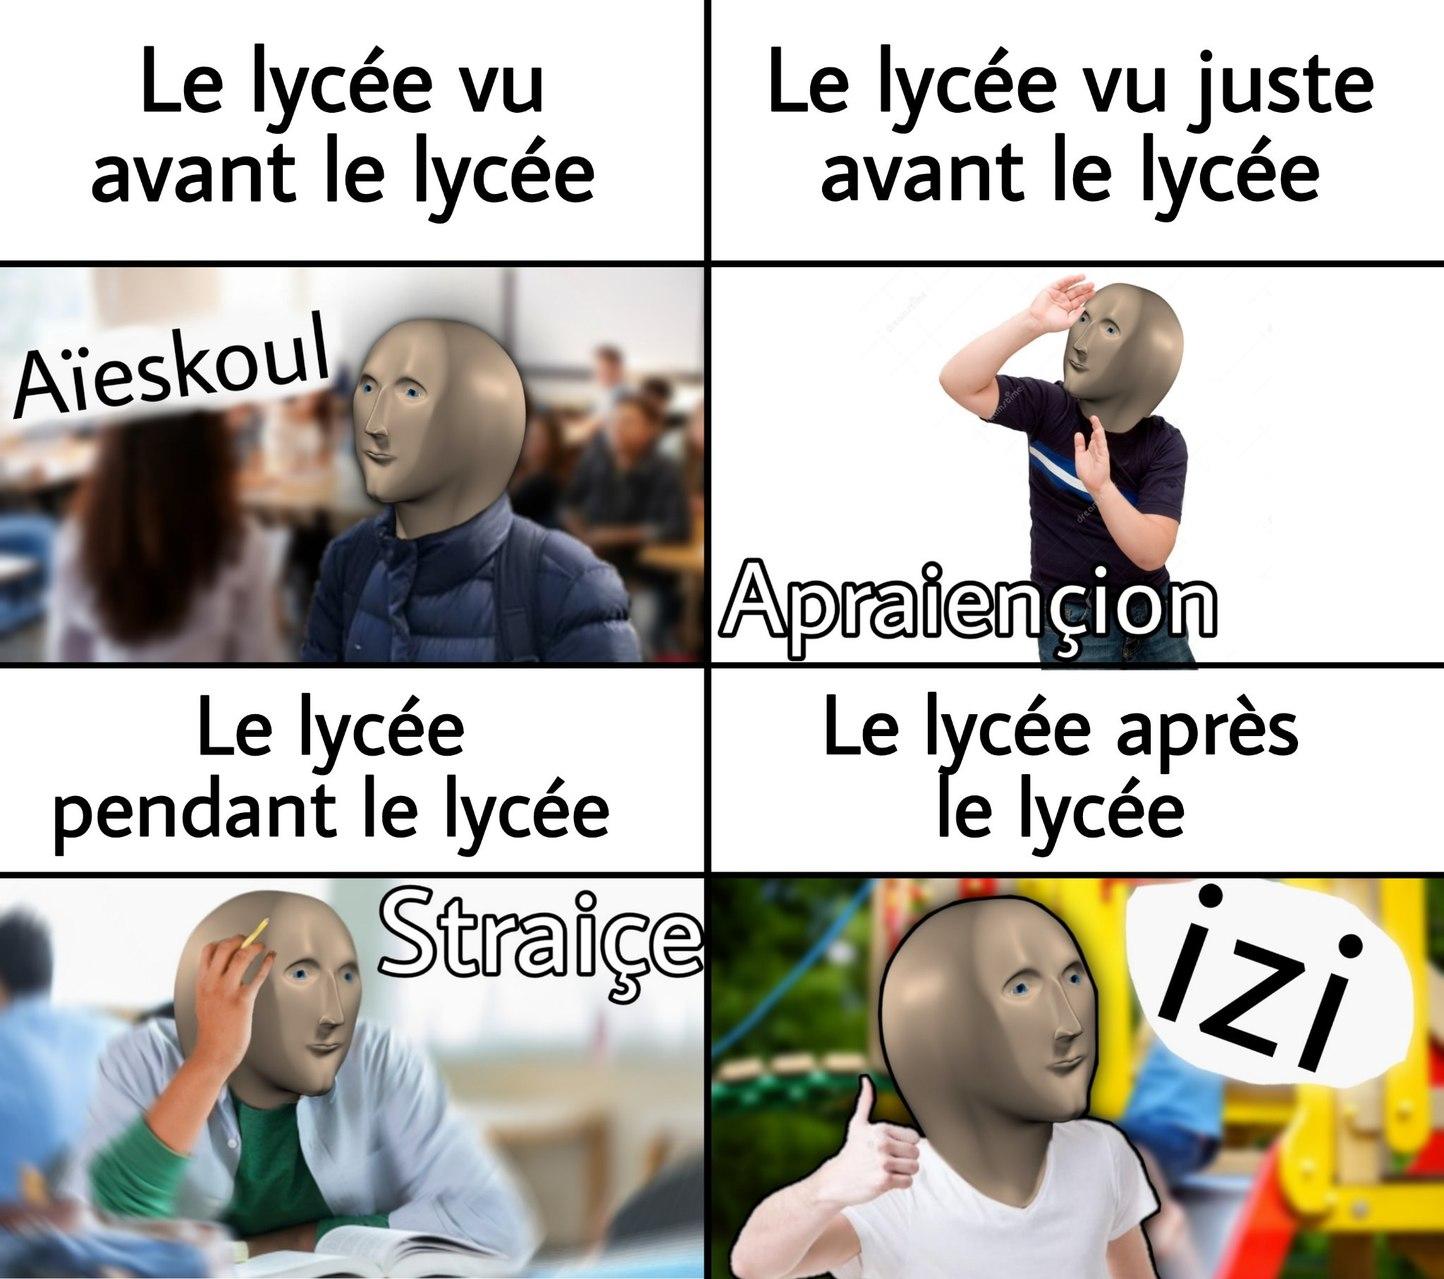 Haha aïeskoul goes brrr - meme